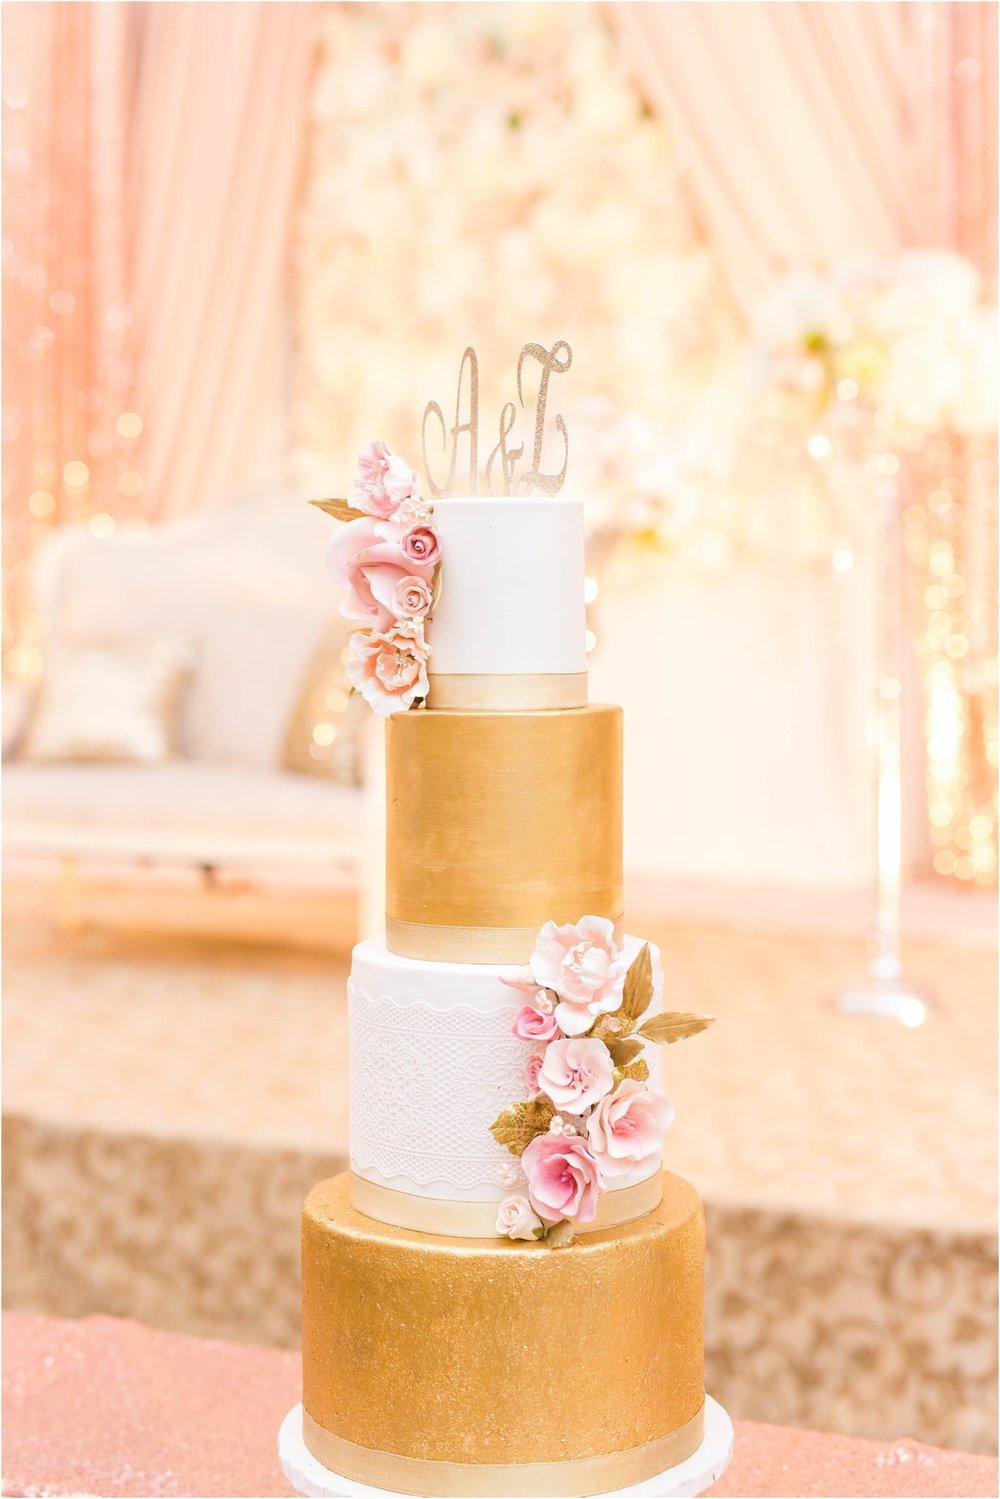 Best-of-2017-Weddings-Toronto-Mississauga-Brampton-Scarborough-GTA-Pakistani-Indian-Wedding-Engagement-Photographer-Photography_0032.jpg